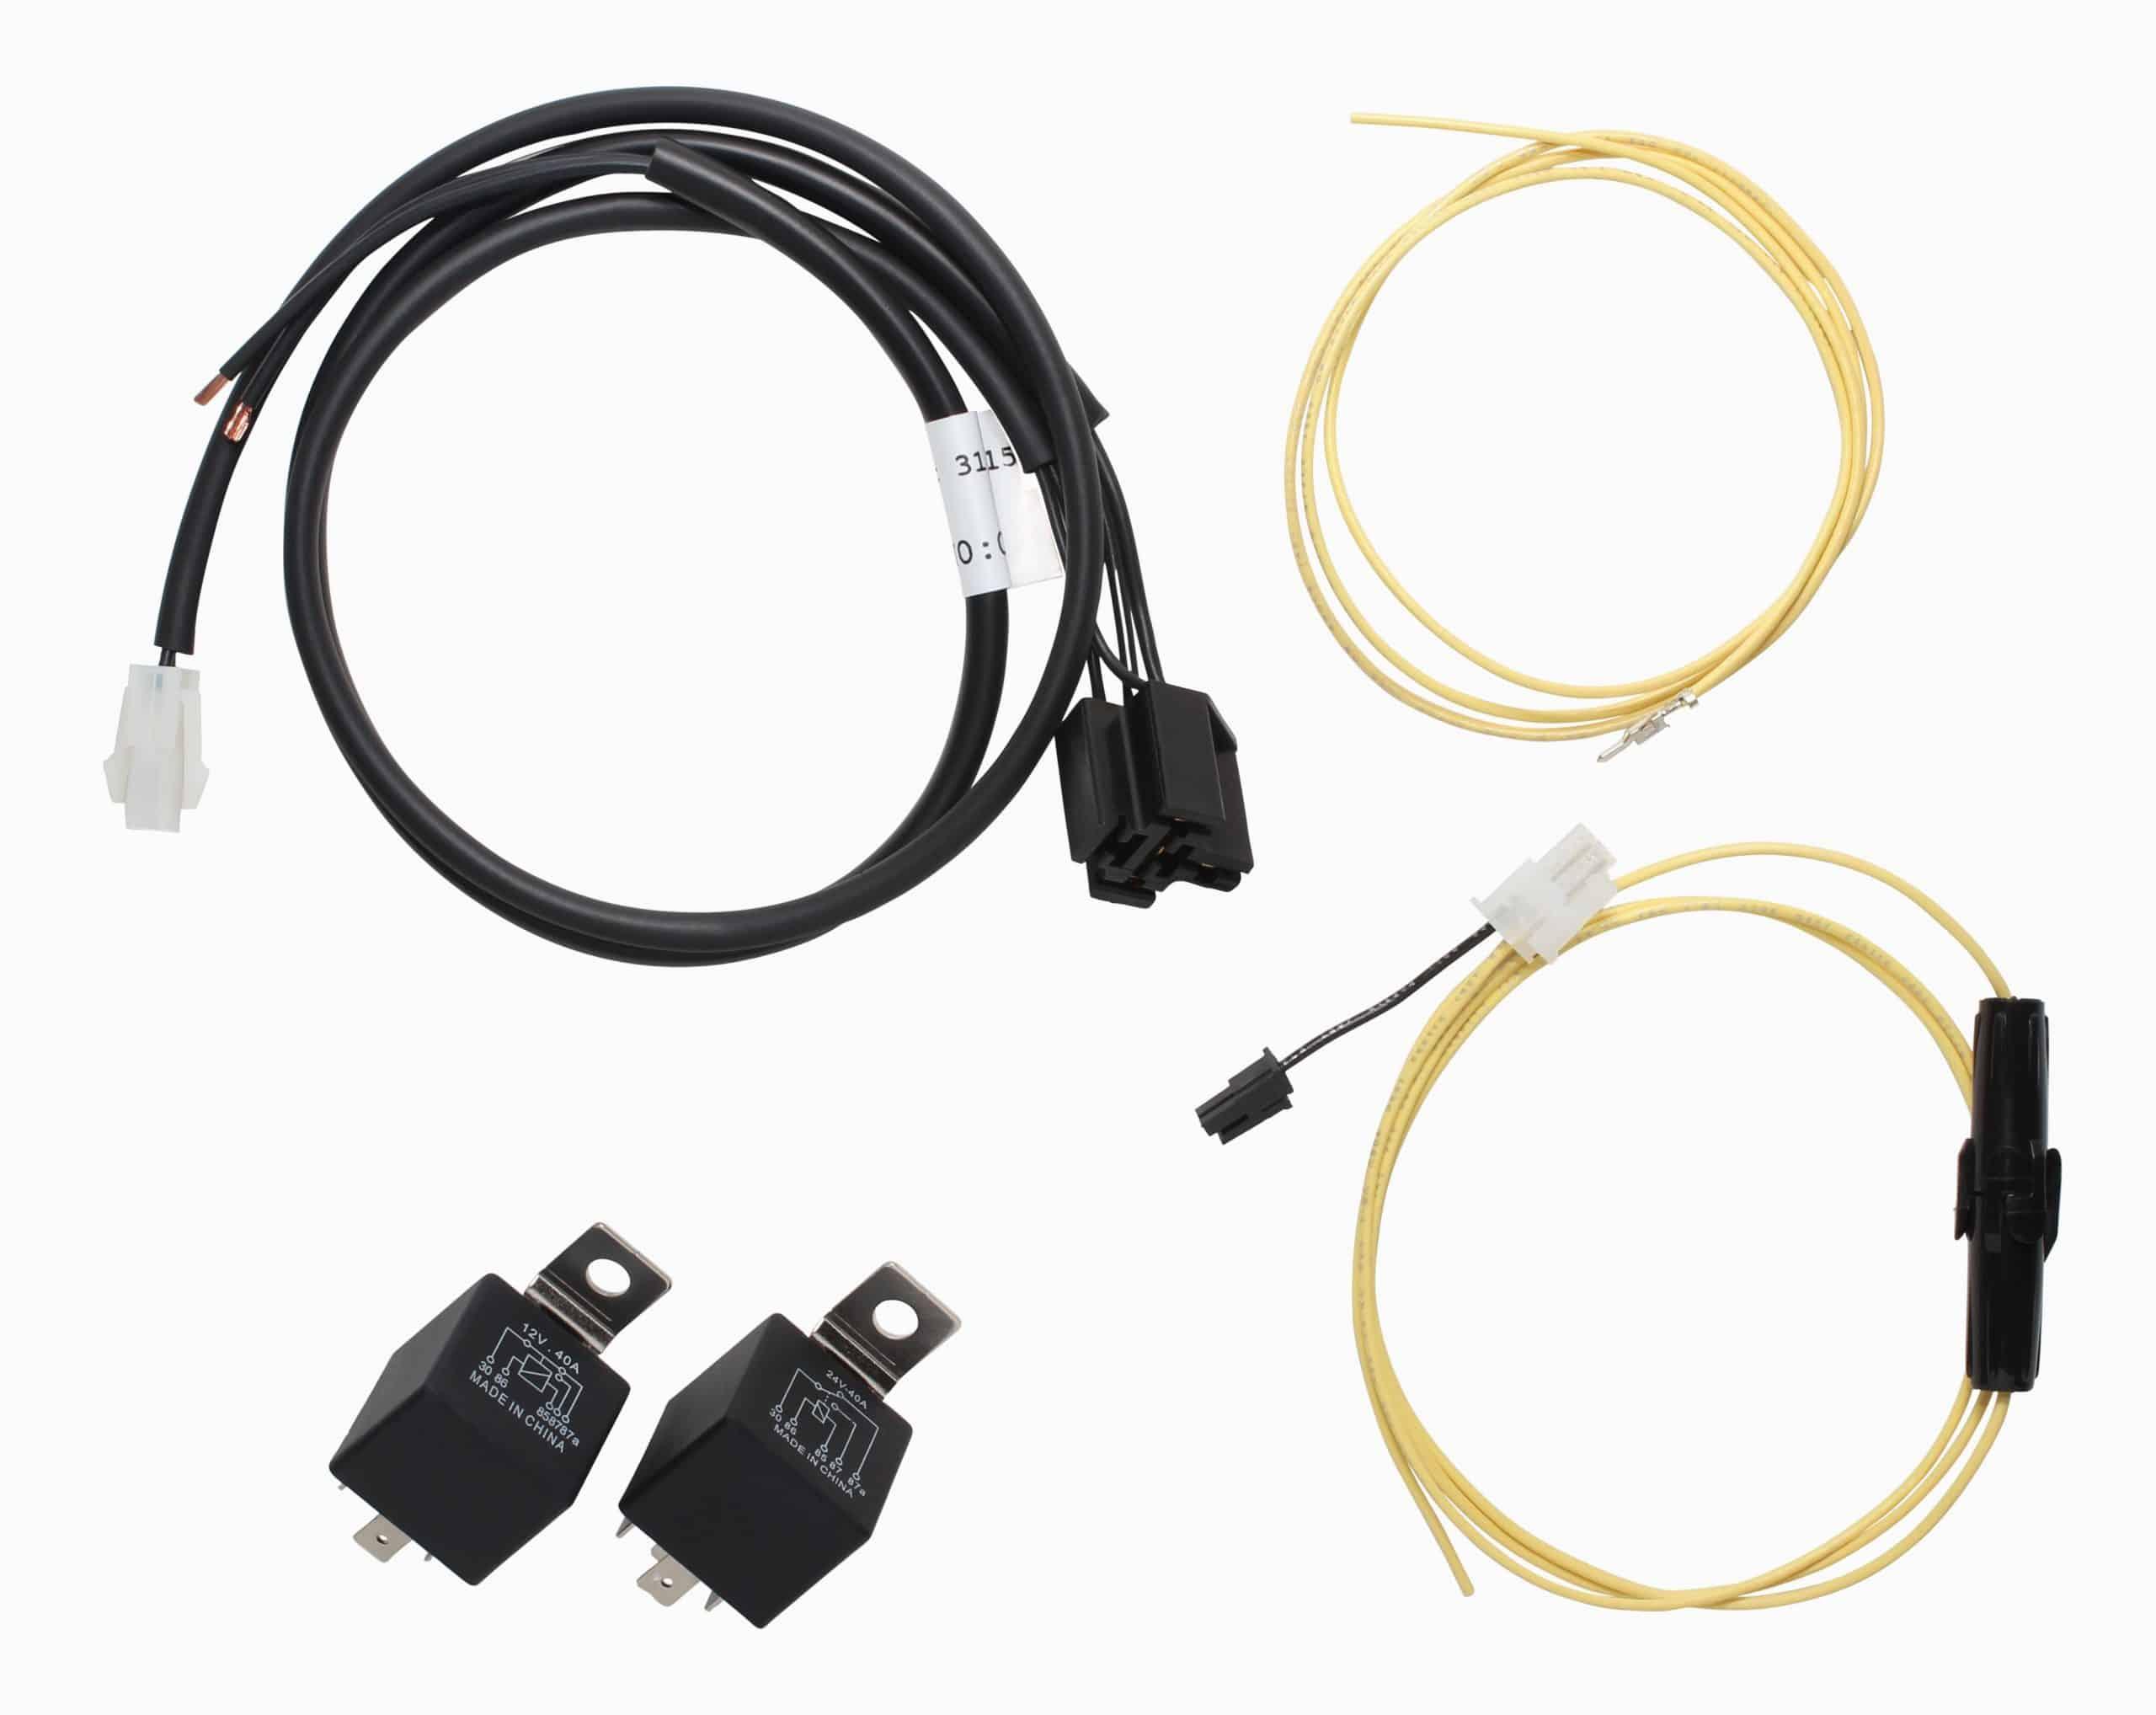 Bild: Geotab SPR-RELAYKIT Fahreridentifikationsrelais-Kit für GO-Geräte